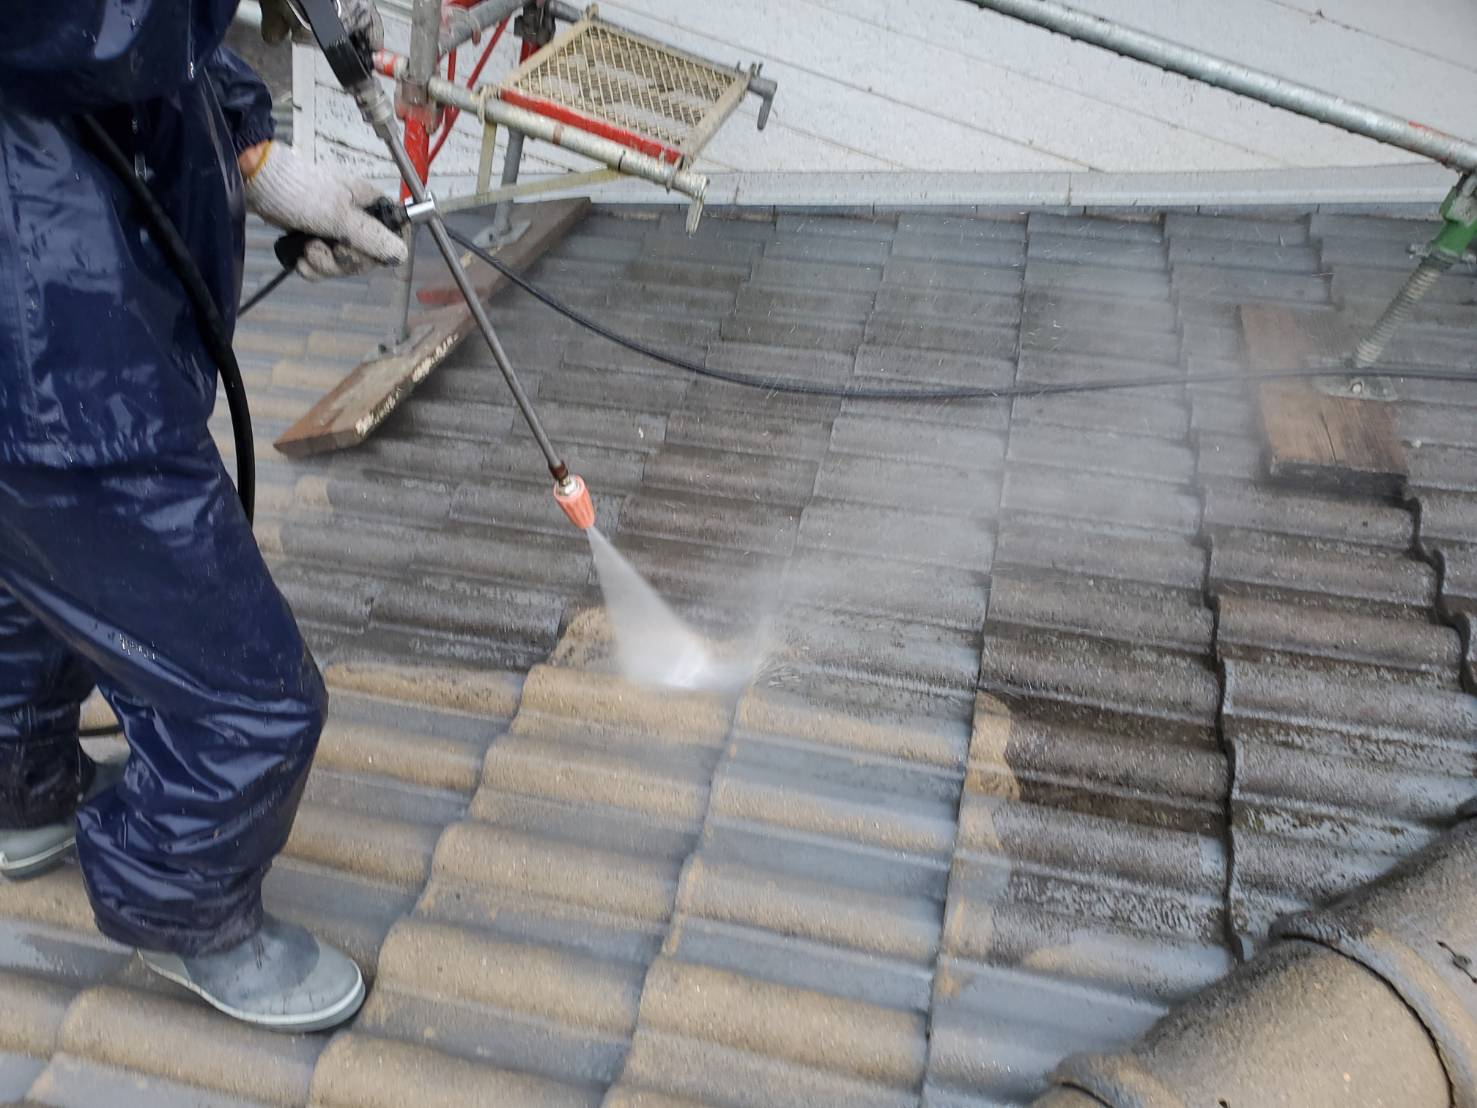 佐賀市 外壁塗装 塗装 ひろし 屋根塗装 高圧洗浄